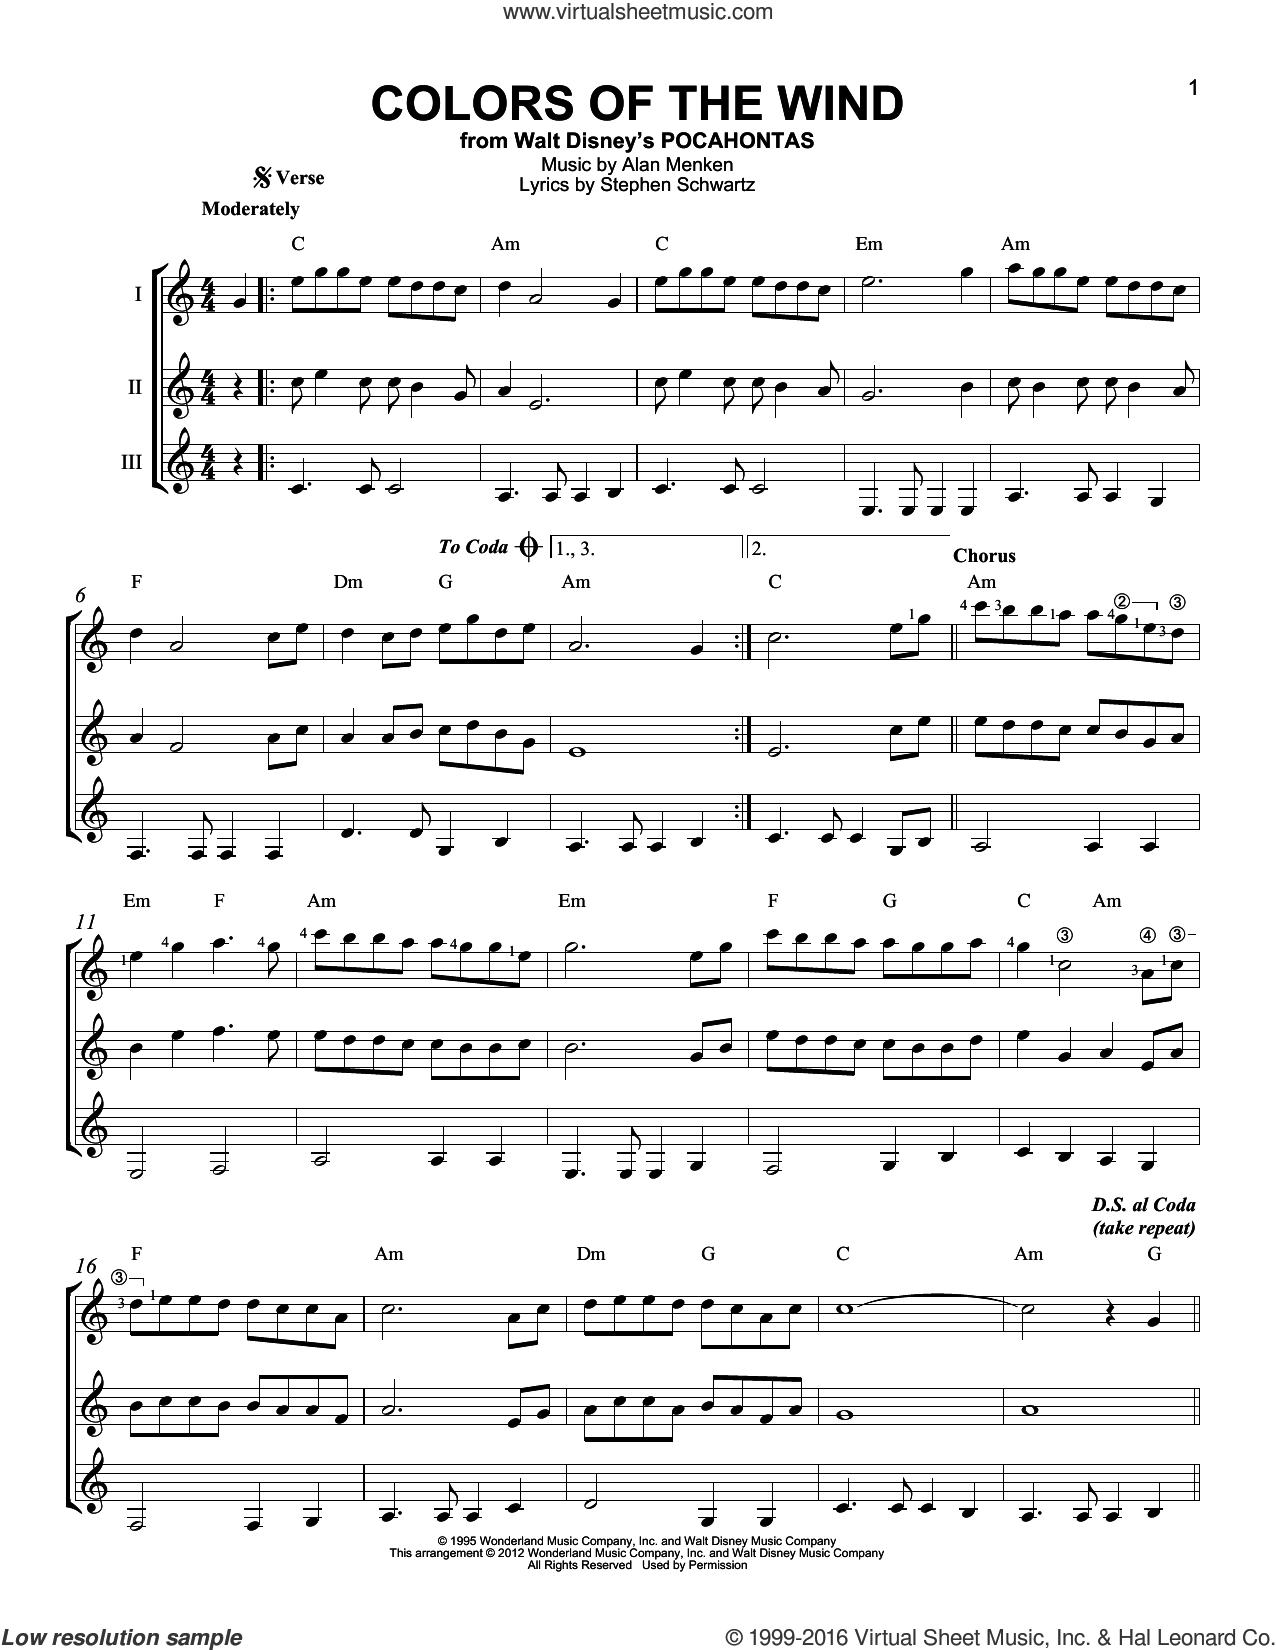 Colors Of The Wind sheet music for guitar ensemble by Alan Menken, Alan Menken & Stephen Schwartz, Stephen Schwartz and Vanessa Williams, intermediate skill level